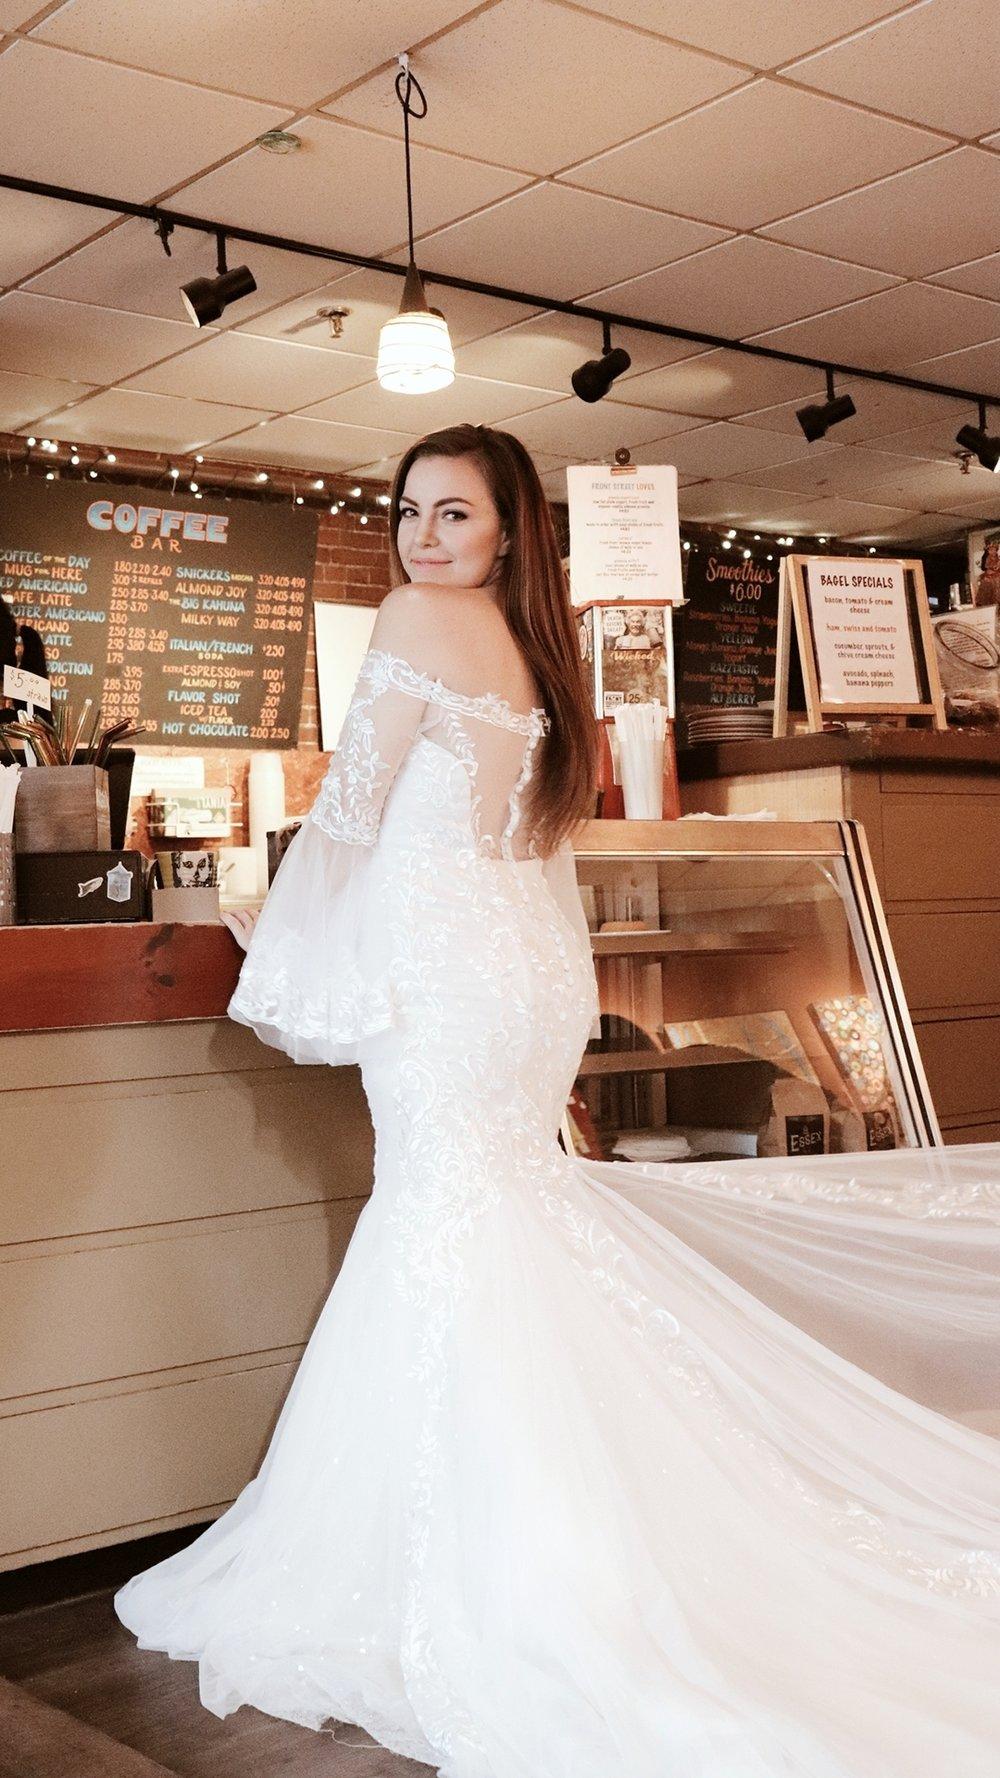 bride ordering coffee